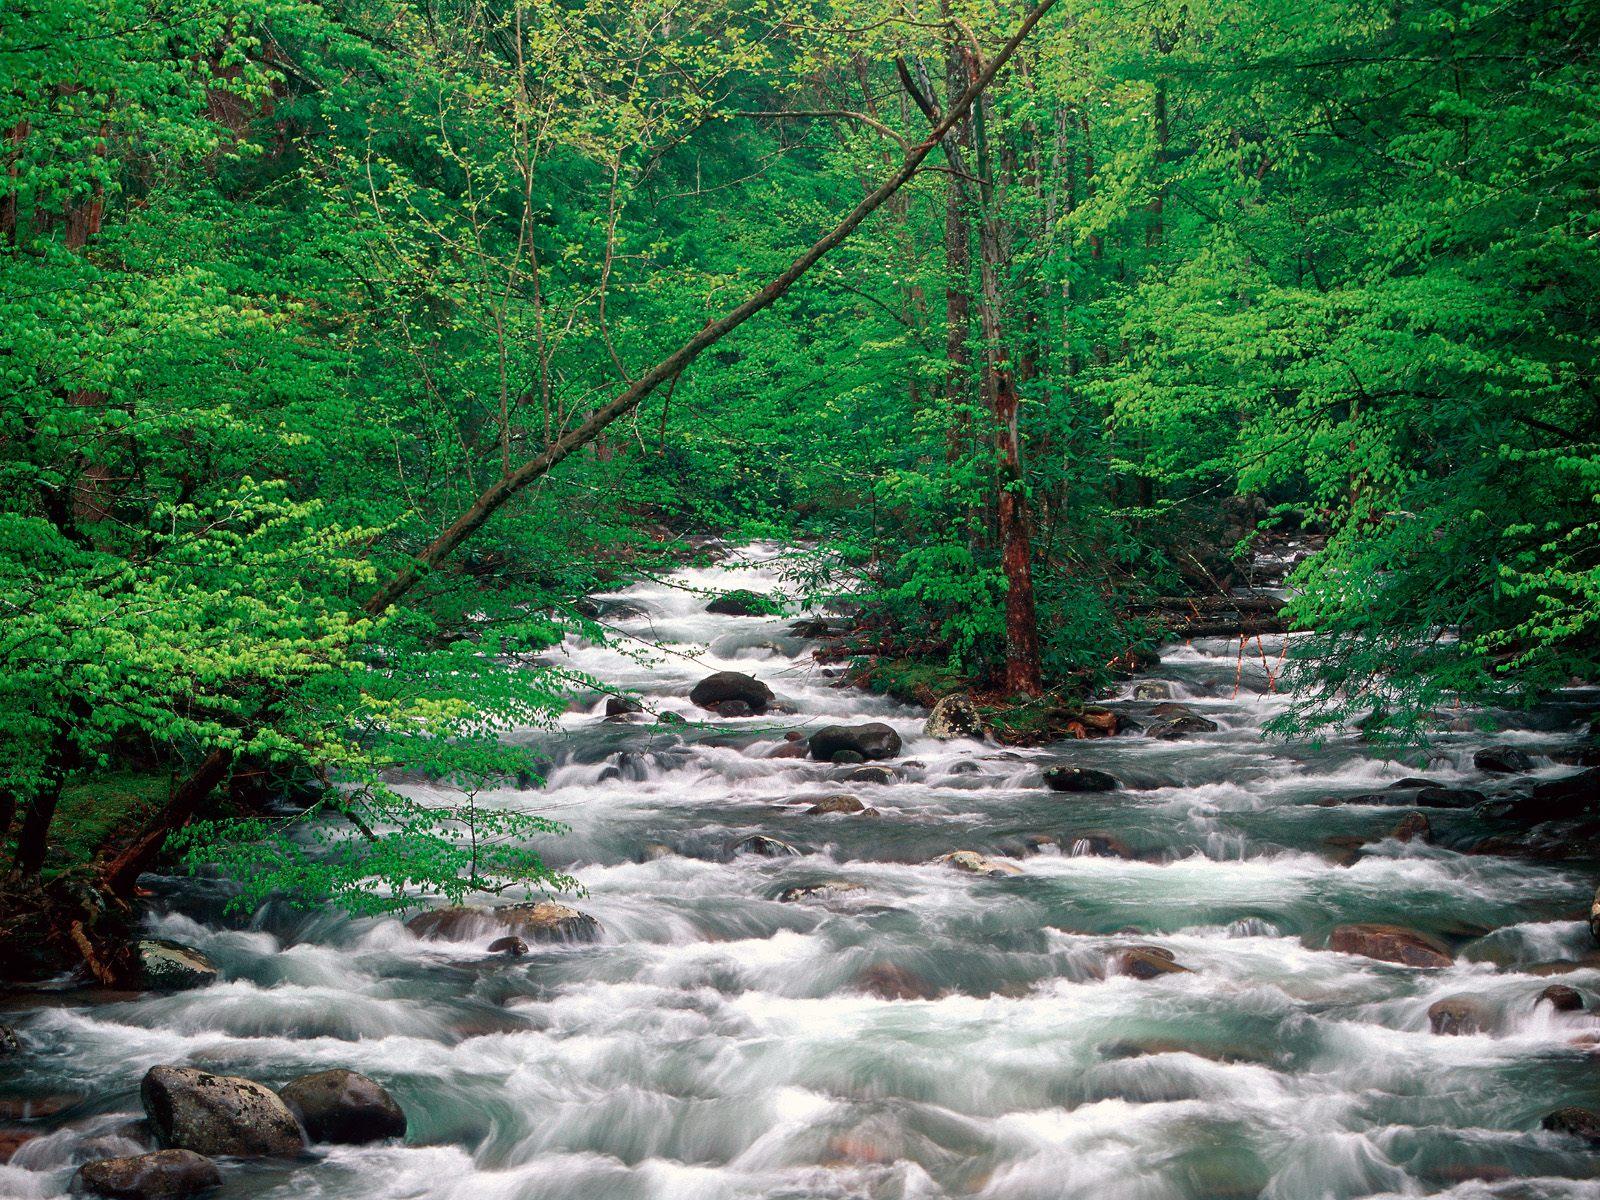 http://4.bp.blogspot.com/_ioD6UOQqcyA/Sw73c7M8_OI/AAAAAAAABdQ/rDzbd_F3Fvc/s1600/Little+Pigeon+River,+Great+Smoky+Mountains,+Tennessee.jpg